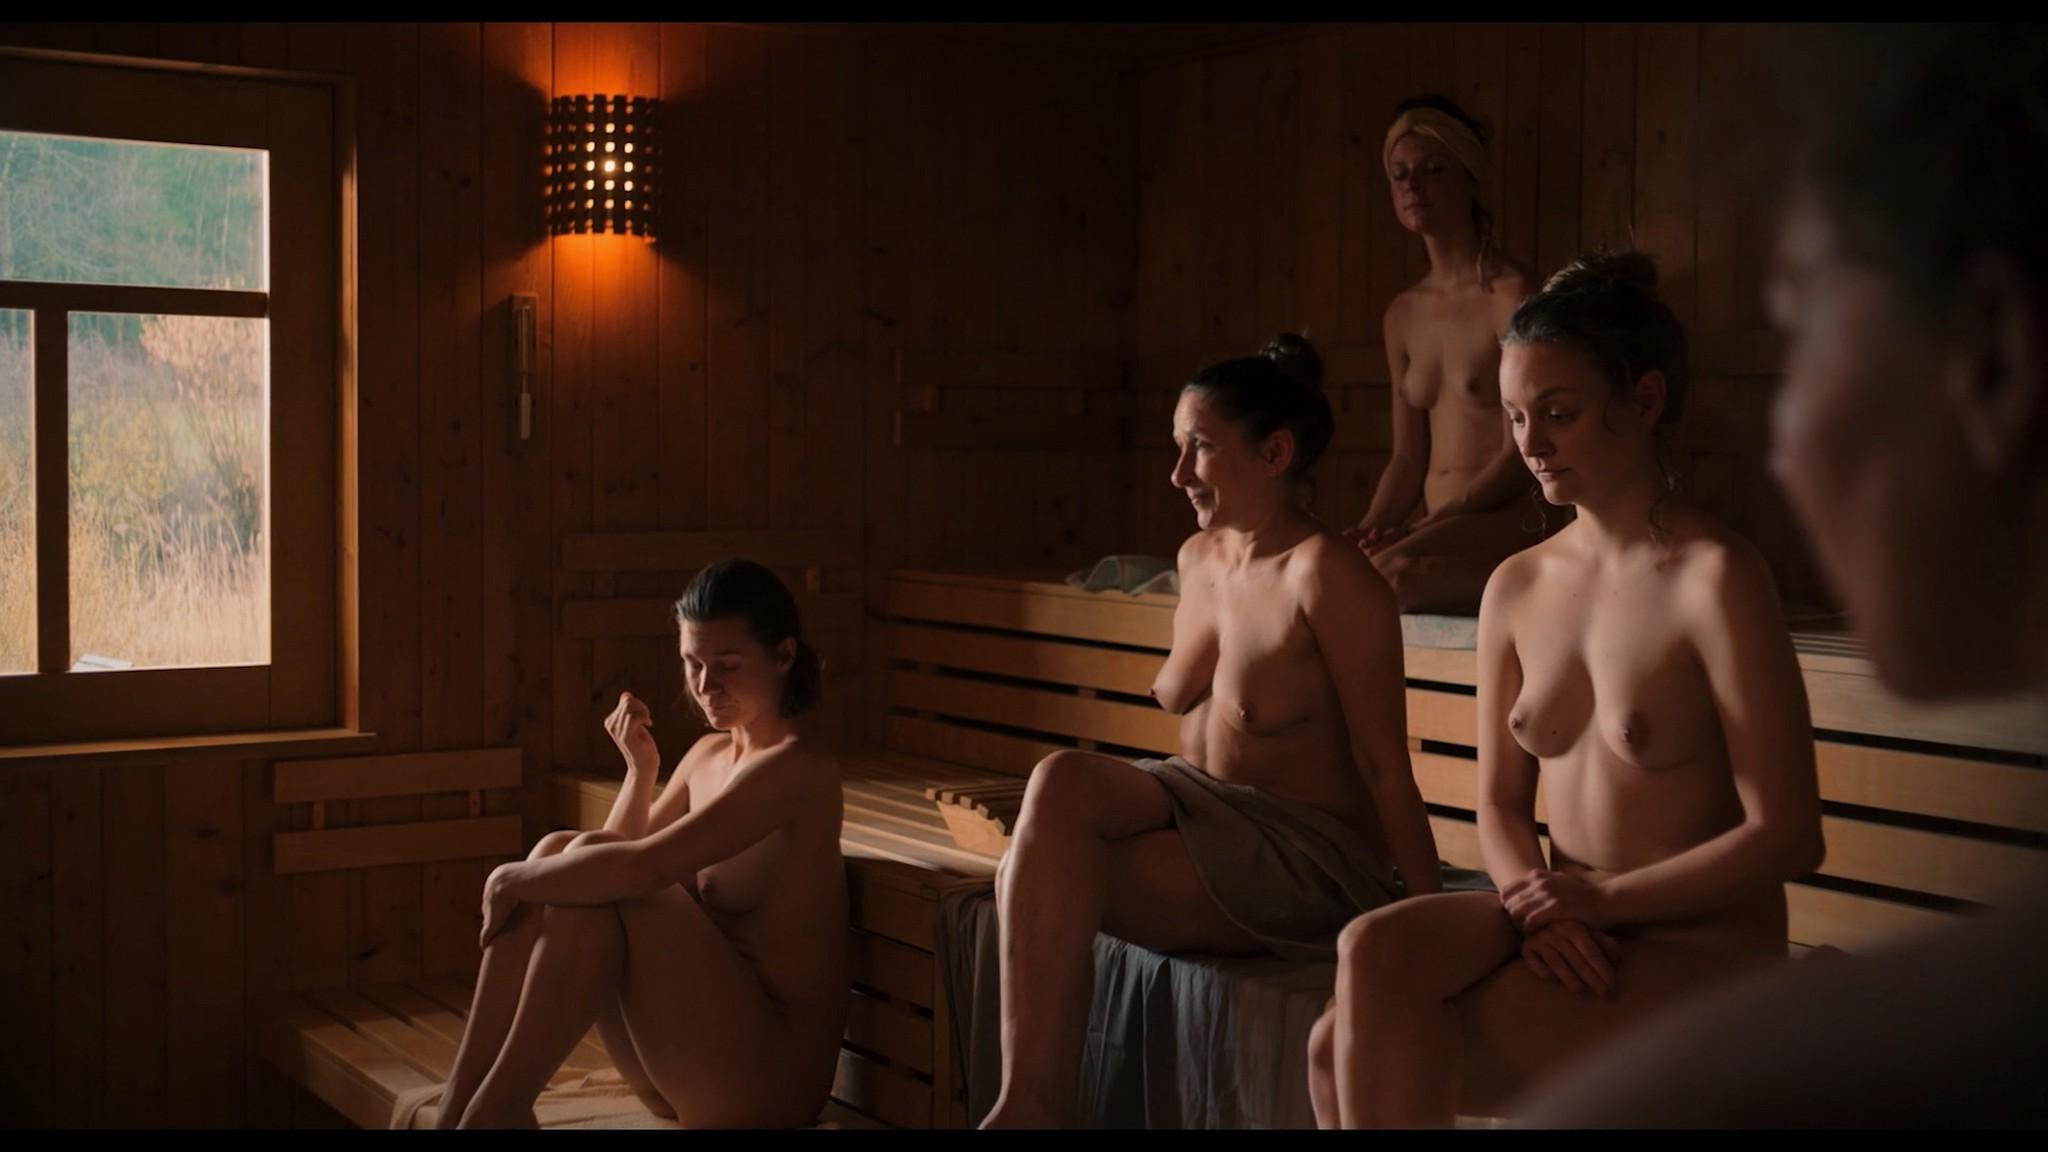 Antonia Bill nude full frontal Amanda da Gloria Helene Blechinger and others nude too Hitzig Ein Saunagang DE 2021 1080p